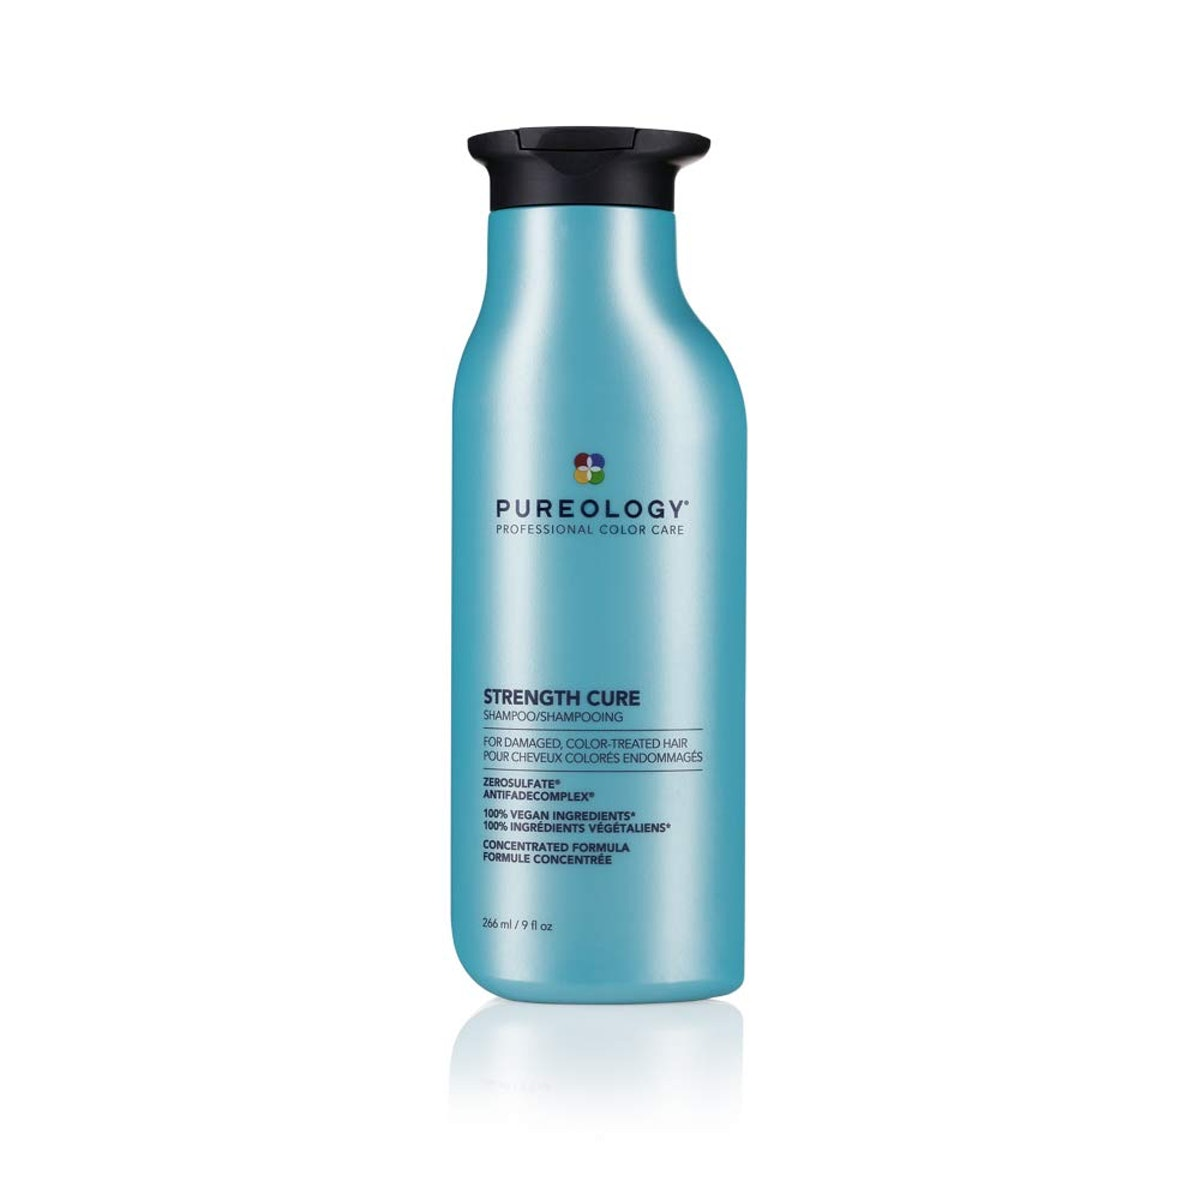 Pureology Strength Cure Strengthening Shampoo